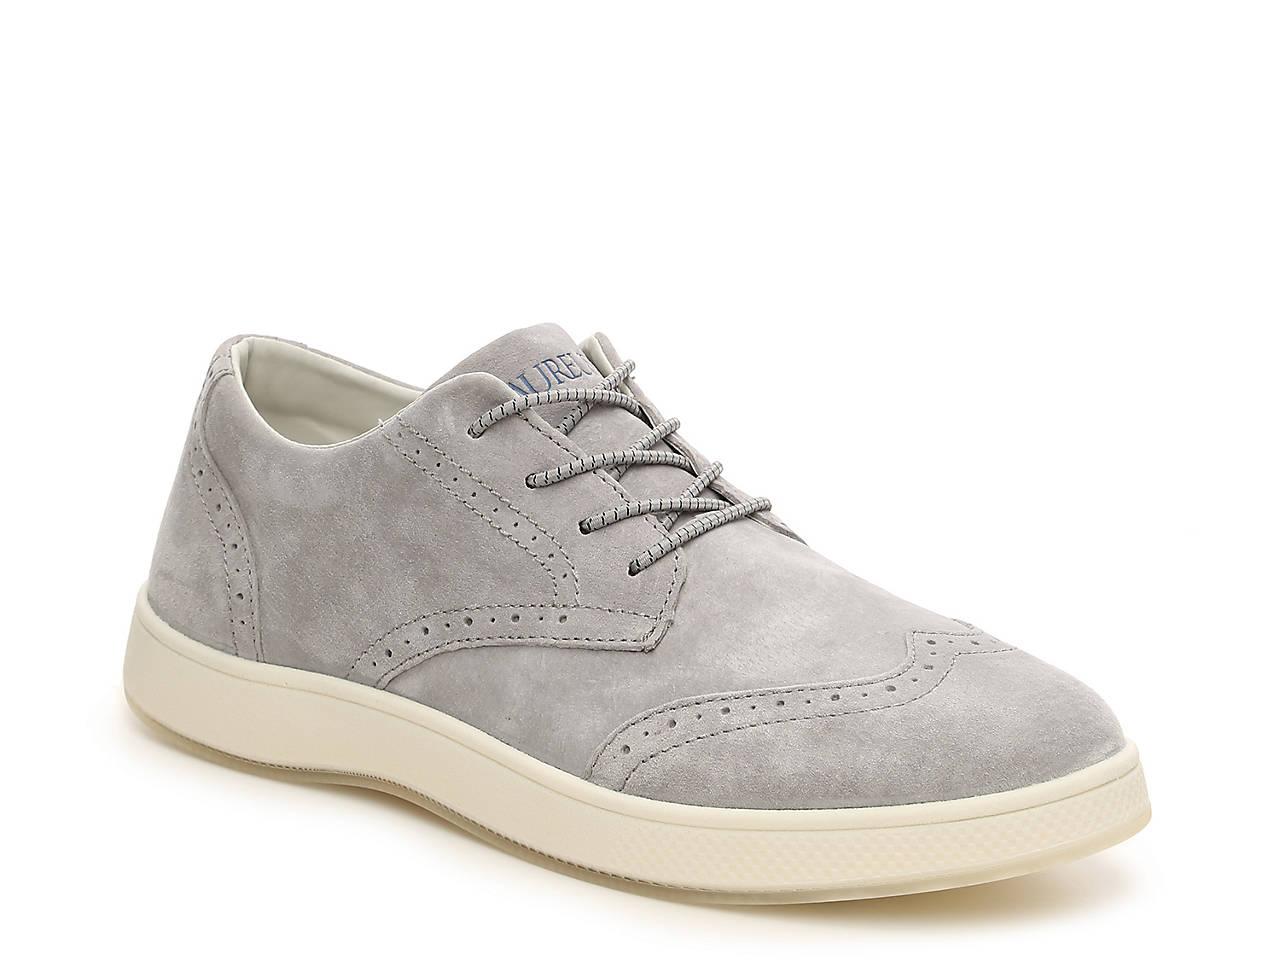 4fc5aa4603a5 Aureus Supra Slip-On Sneaker Men s Shoes